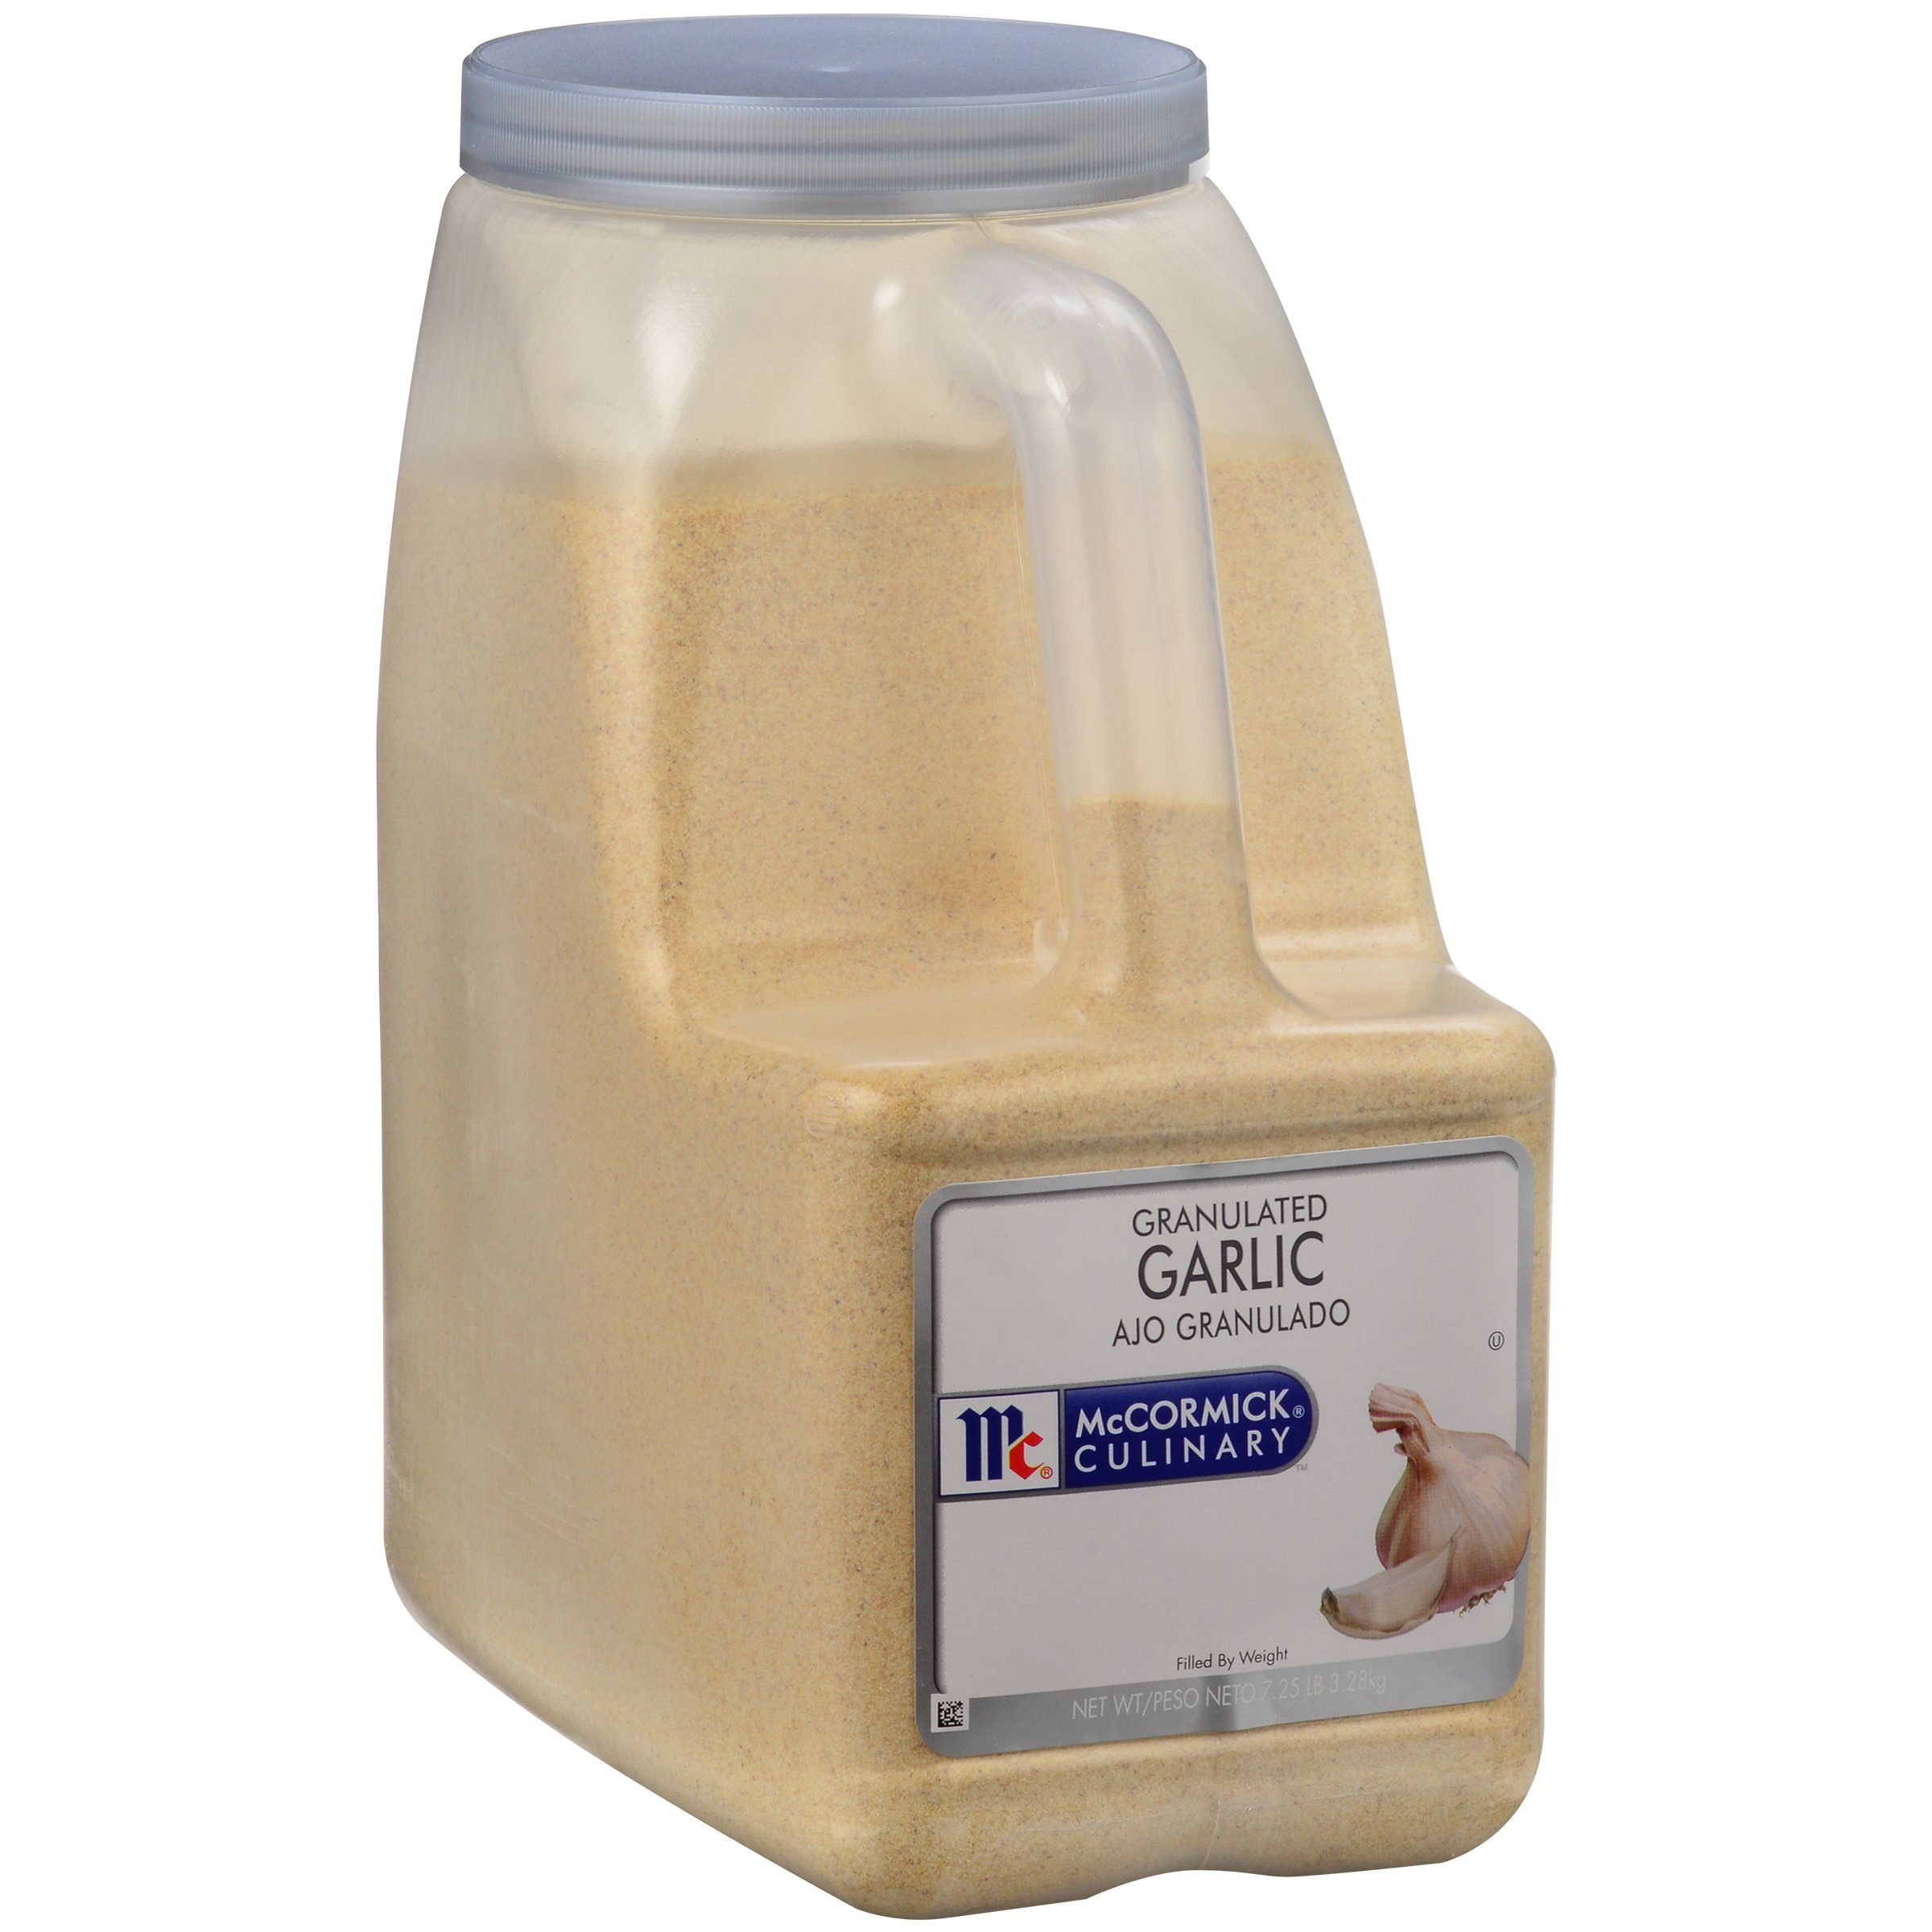 McCormick Culinary Granulated Garlic, 7.25 lbs